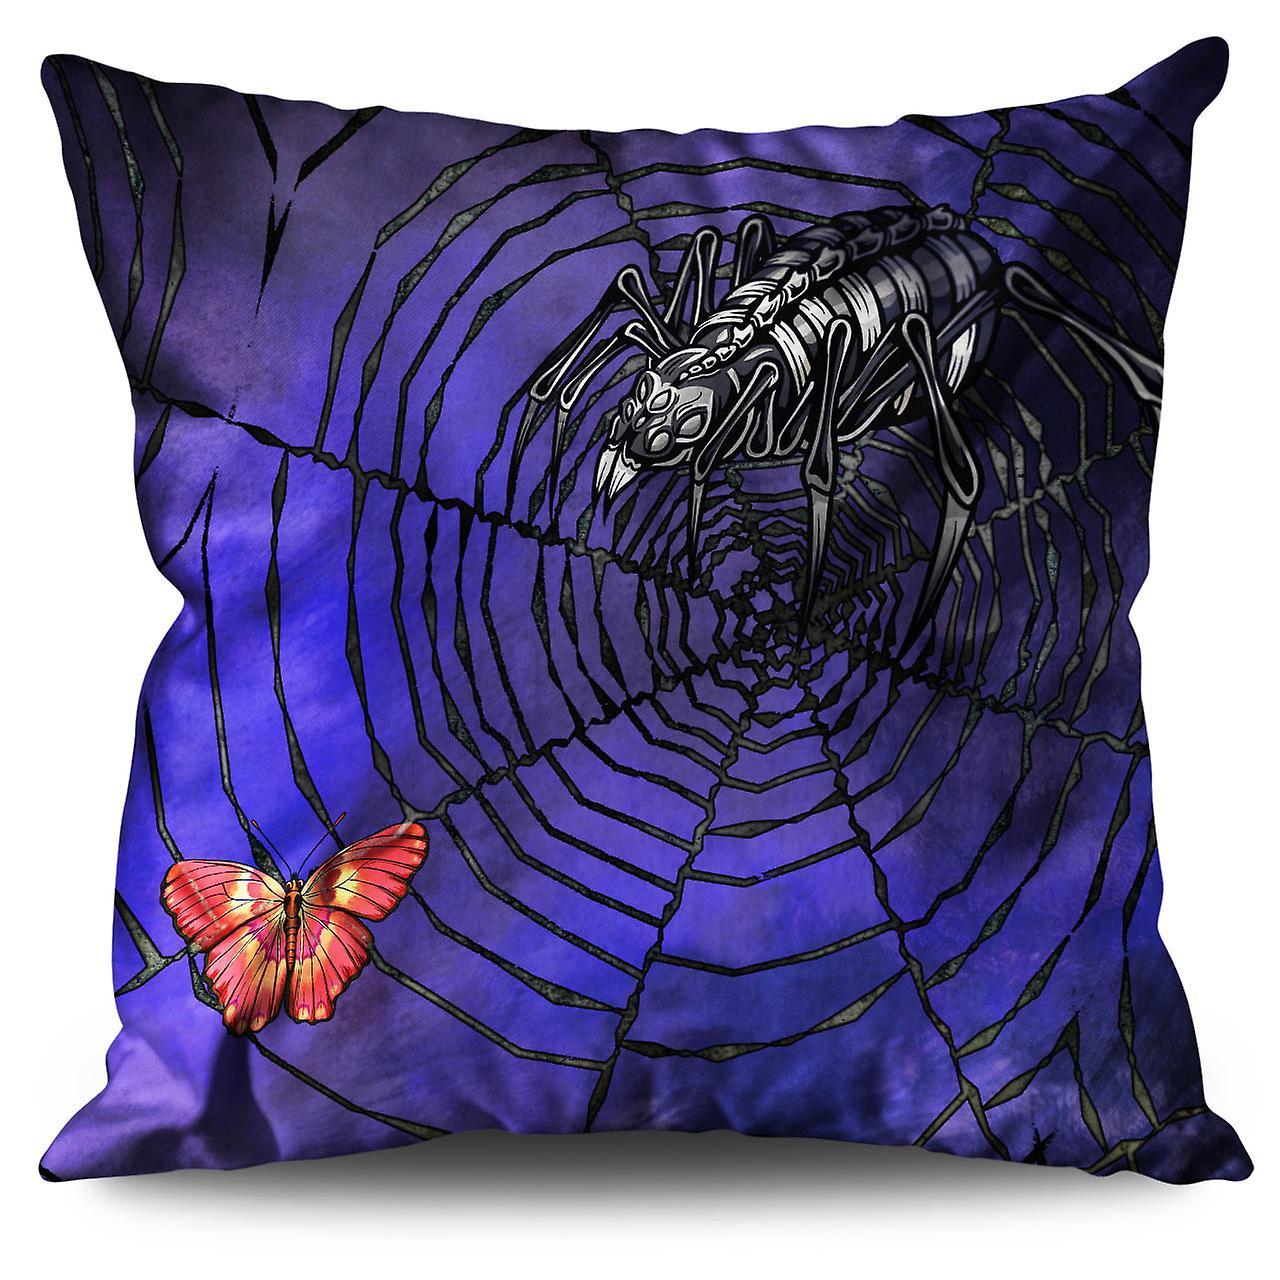 Spider De Nature Sauvage Linge X CmWellcoda Coussin 30 0wNPk8nOX